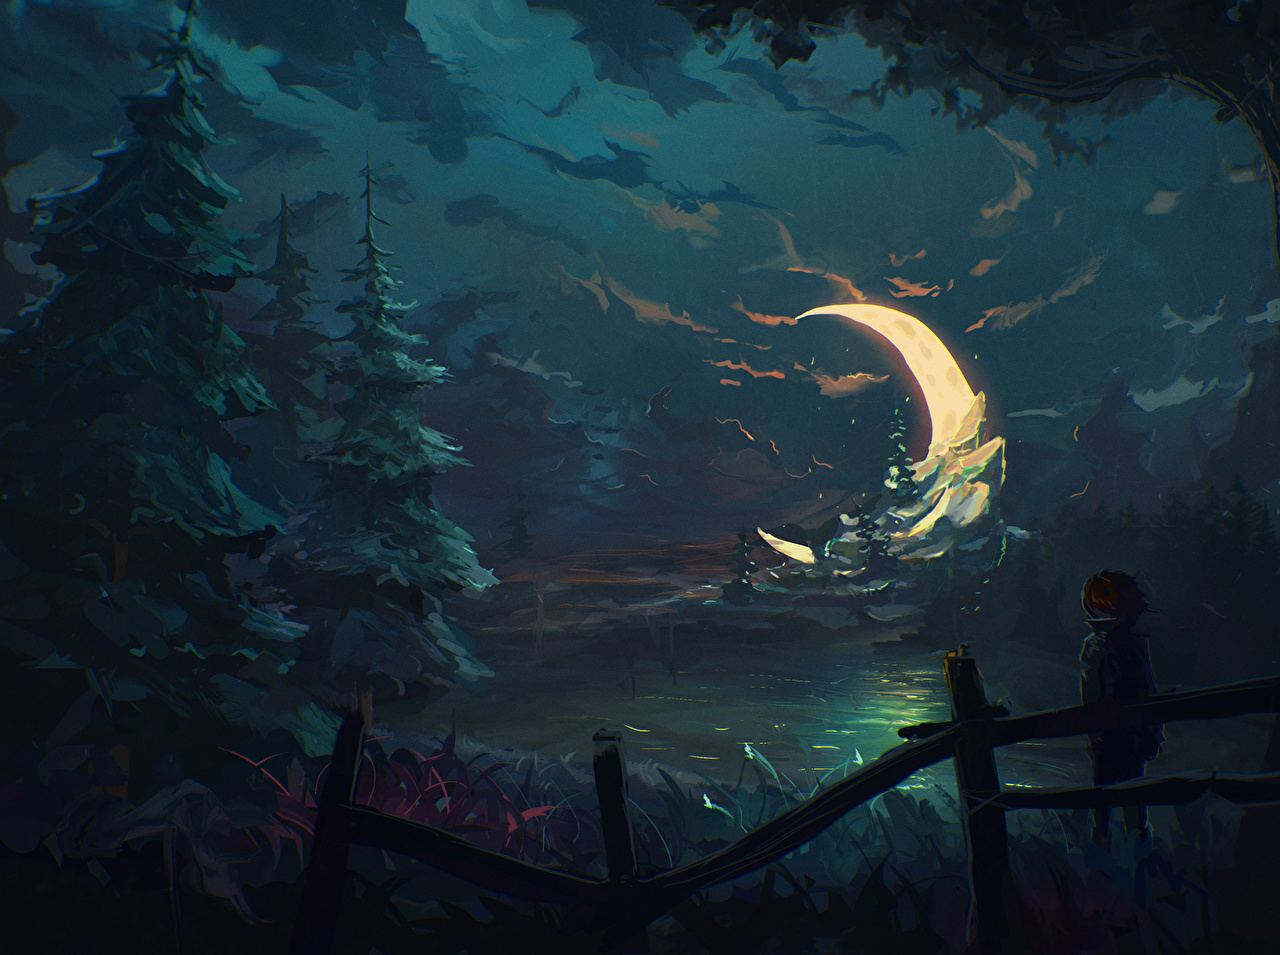 Wallpaper Spruce Nature Fantasy Sky Moon Crescent ...